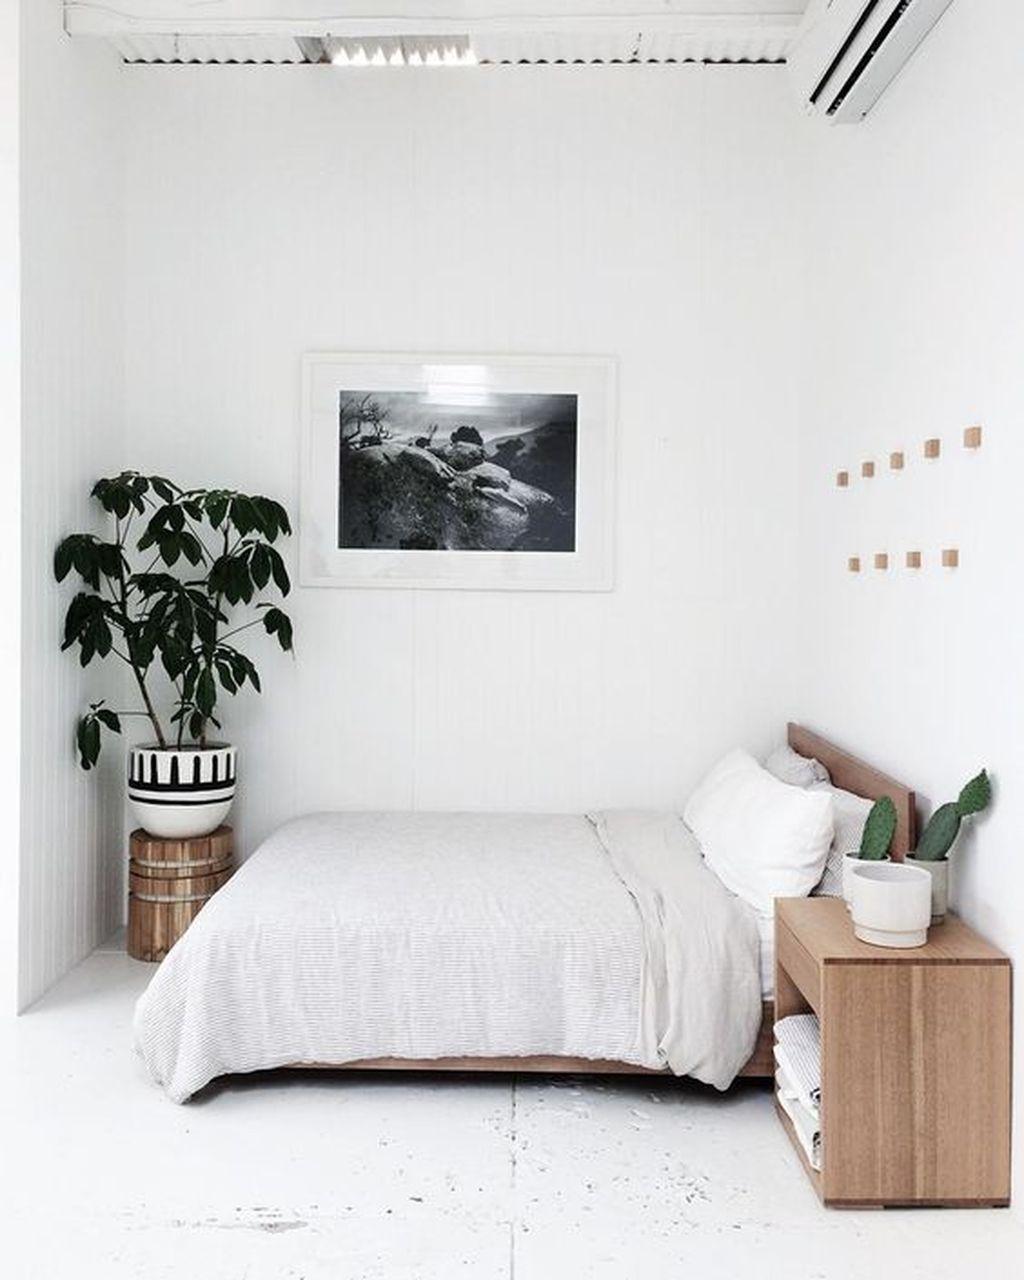 Nice 42 Minimalist Bedroom Ideas For Couple More At Https Goingtotehran Com Bedroom Idea Bedroom Interior Minimalist Bedroom Design Minimalist Bedroom Decor Interior design minimalist bedroom